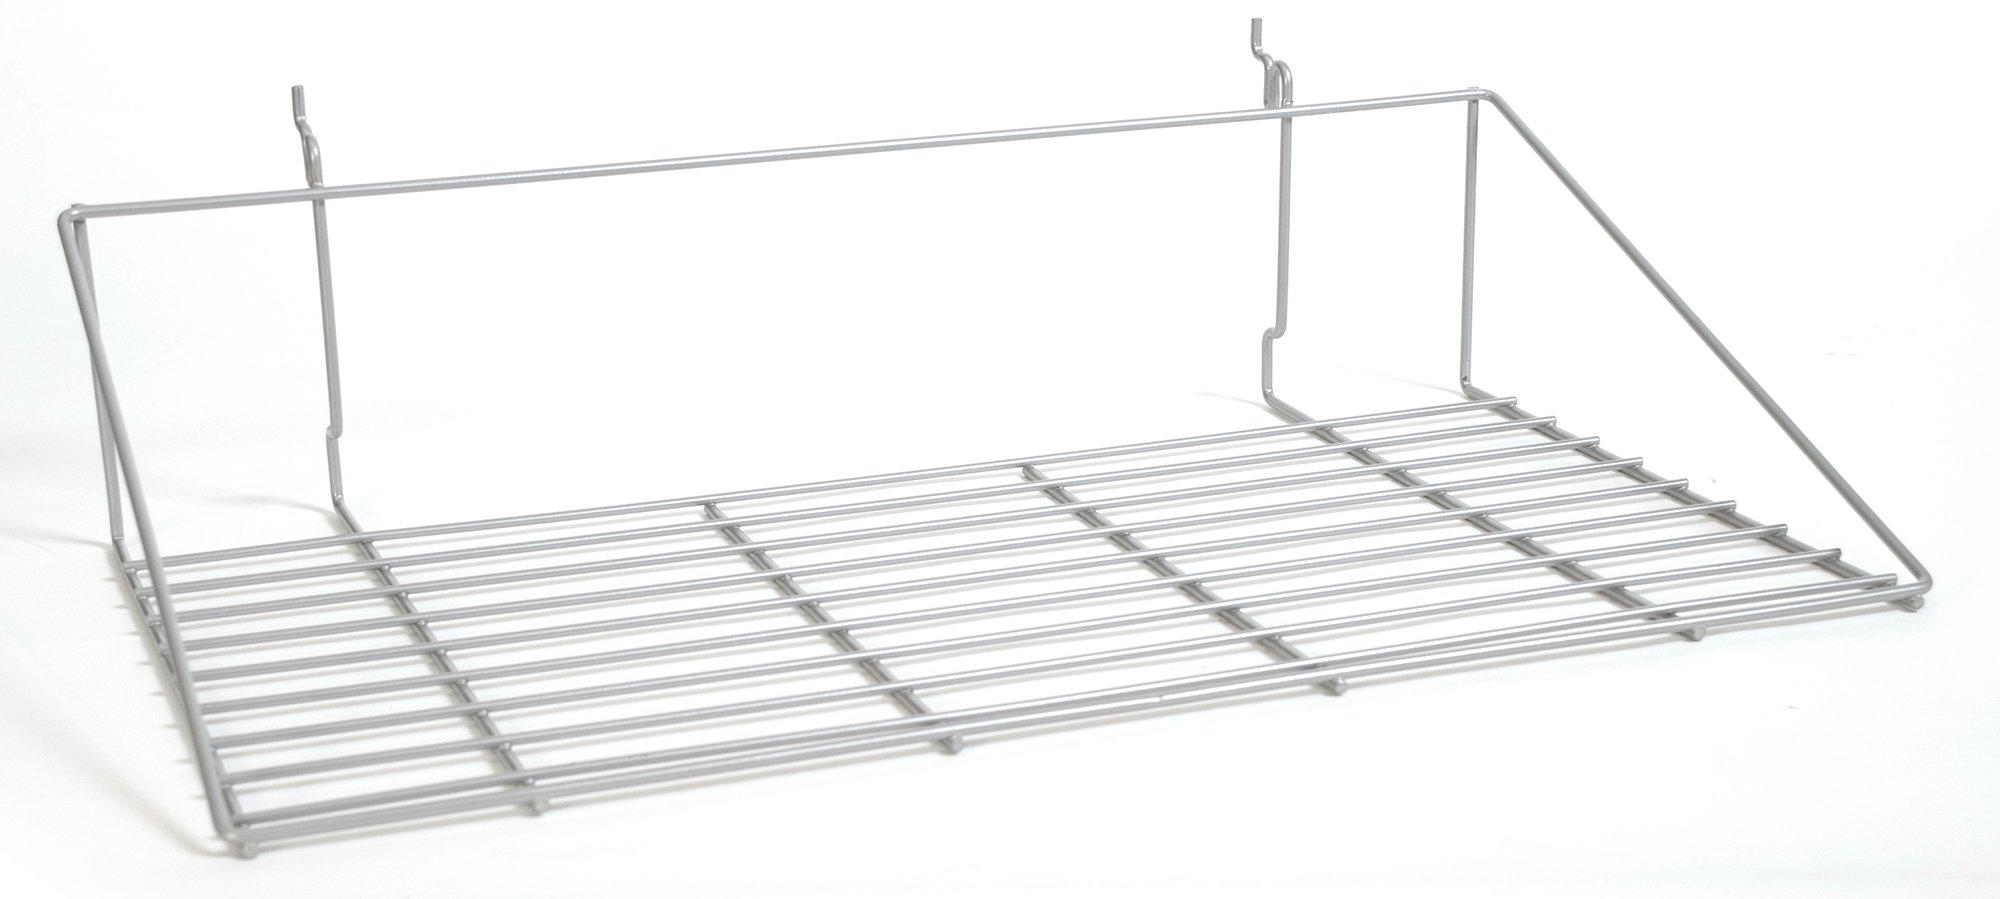 KC Store Fixtures A030109 Double Shirt Shelf Fits Slatwall, Grid, Pegboard,23-1/2'' W x 13-1/2'' D, Pc Chrome (Pack of 10)